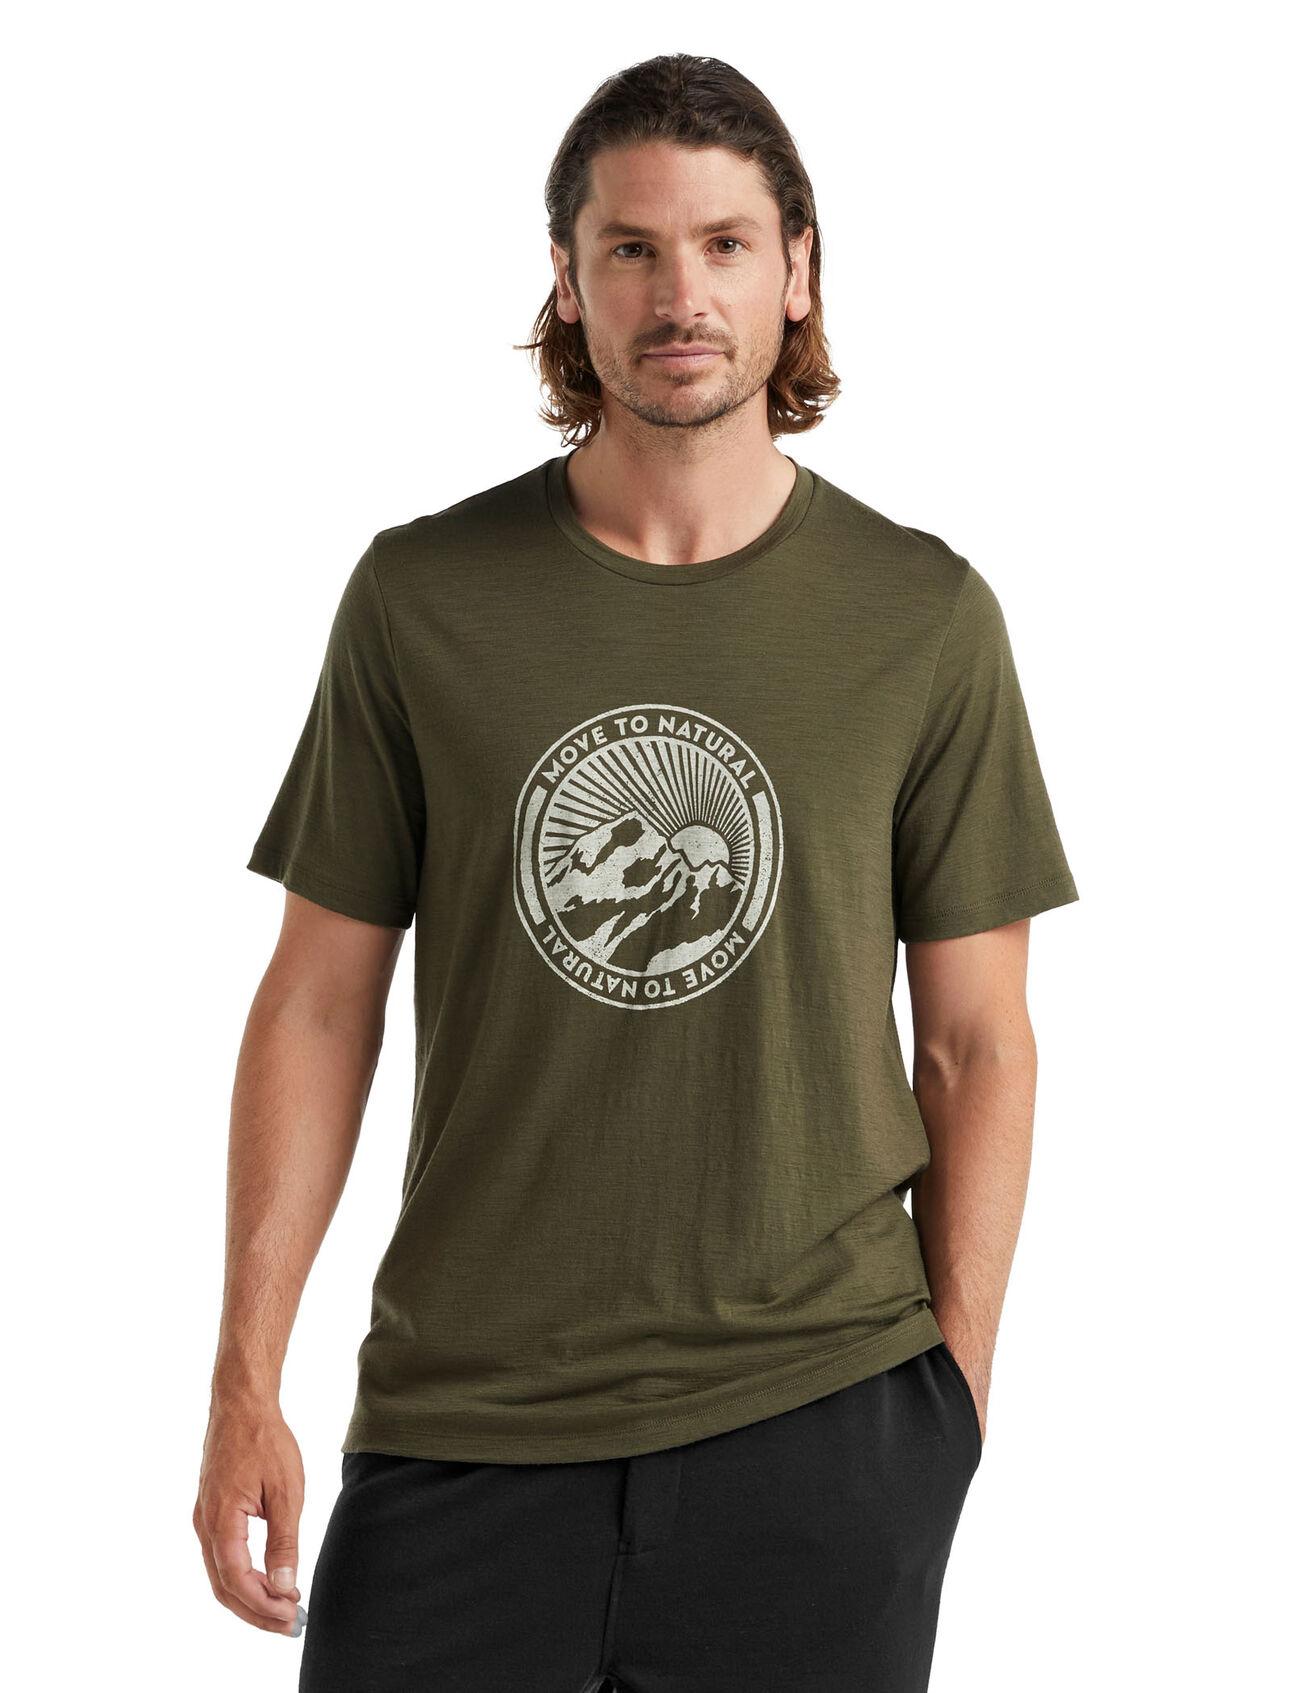 Merino Tech Lite II T-Shirt Move to Natural Mountain